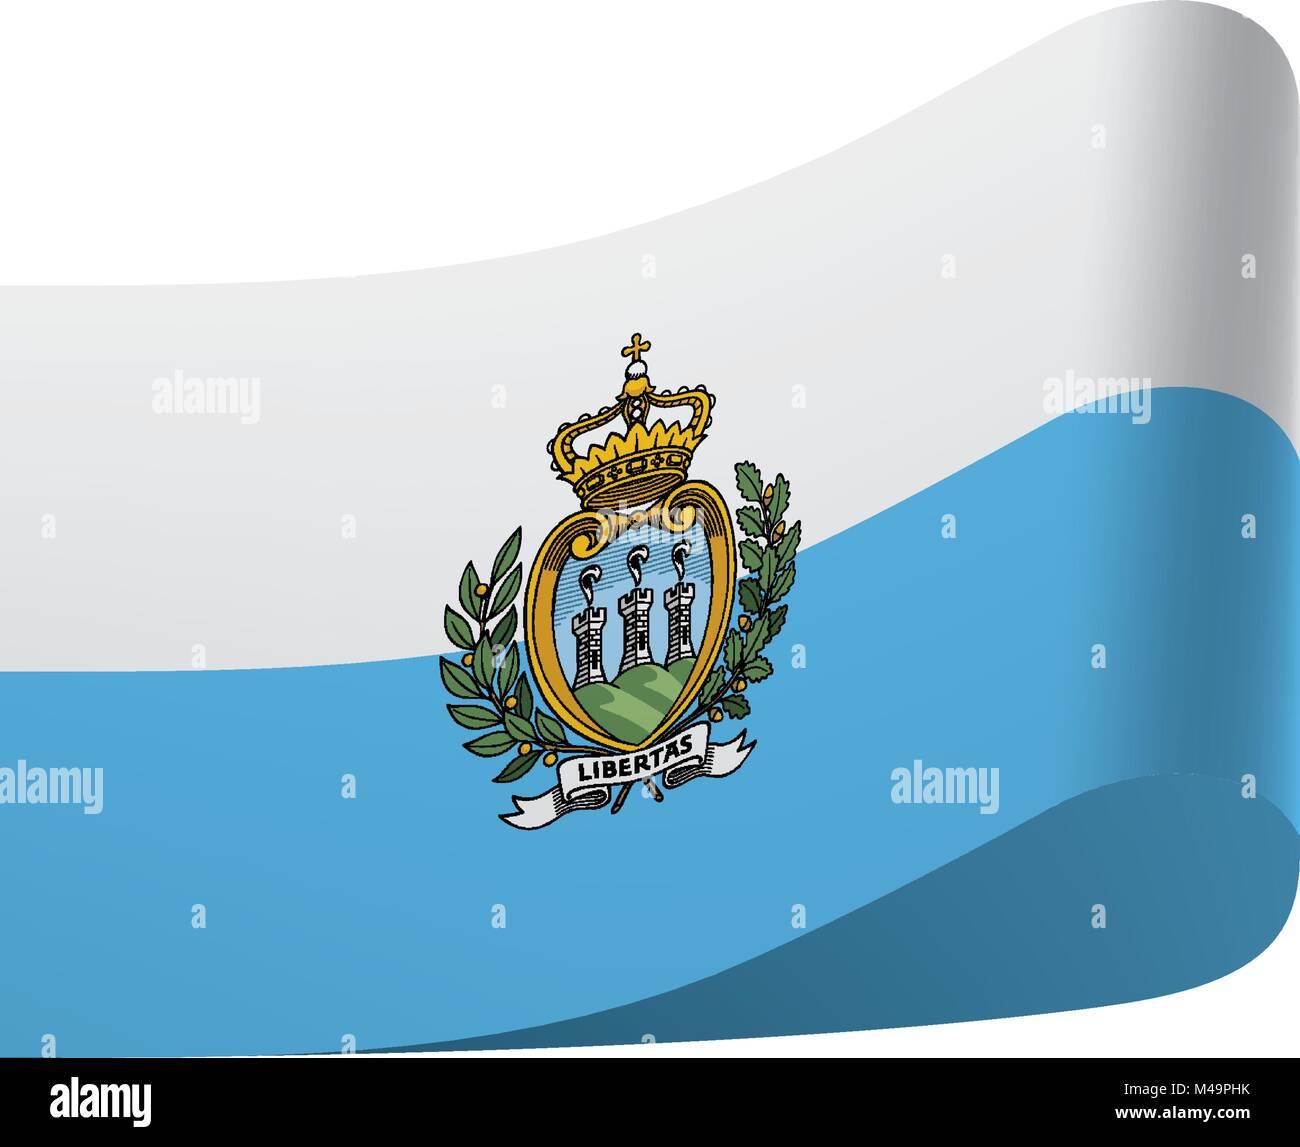 San Marino flag, vector illustration - Stock Image